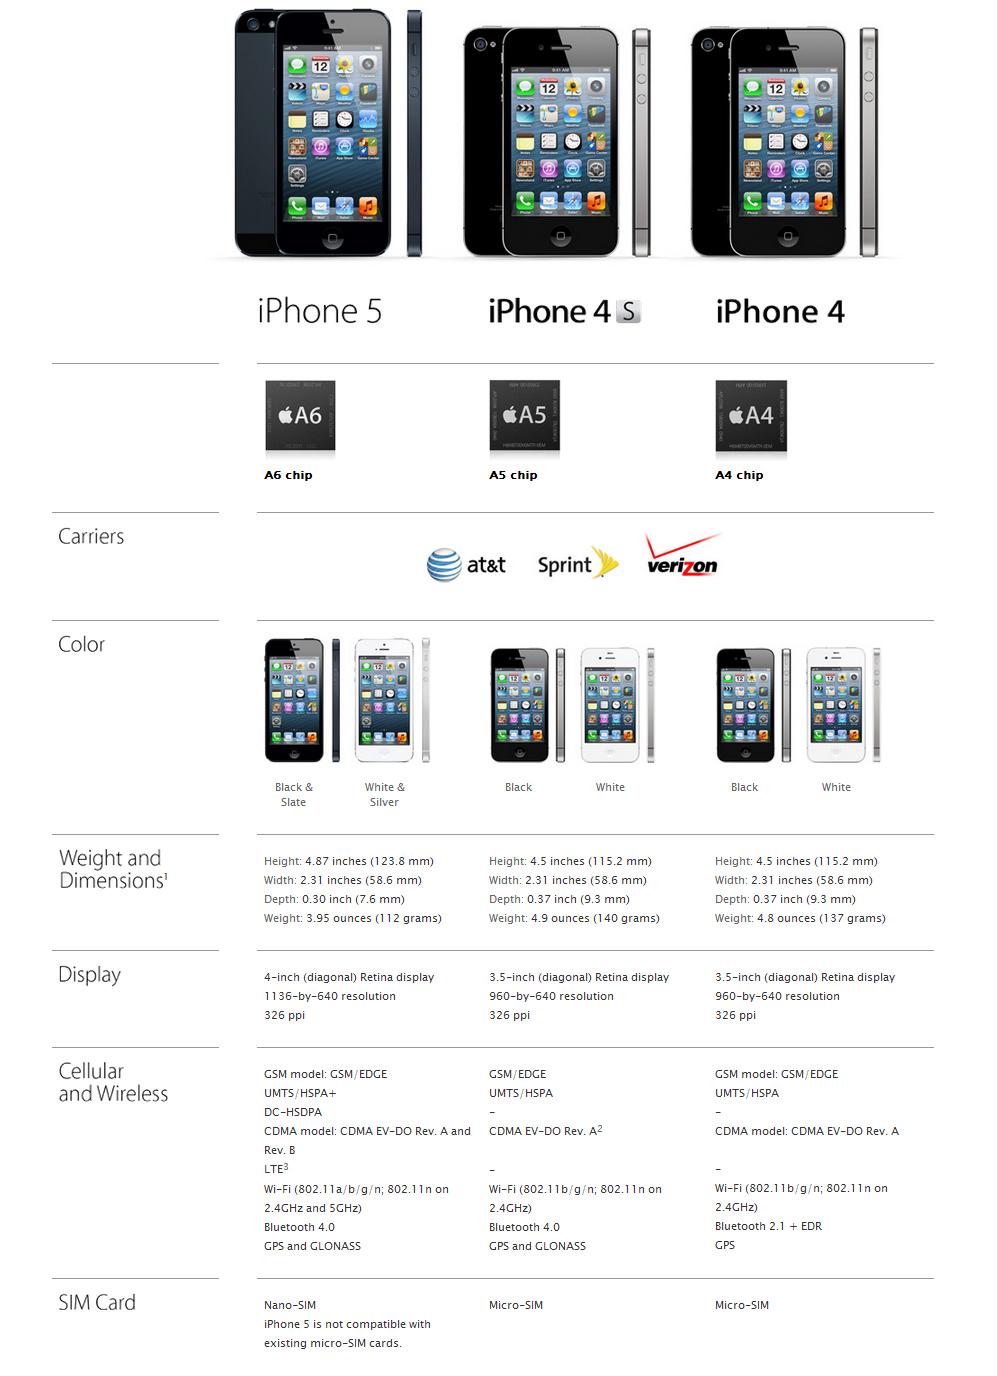 iphone 5 vs iphone 4s vs iphone 4 infographie info magazine. Black Bedroom Furniture Sets. Home Design Ideas